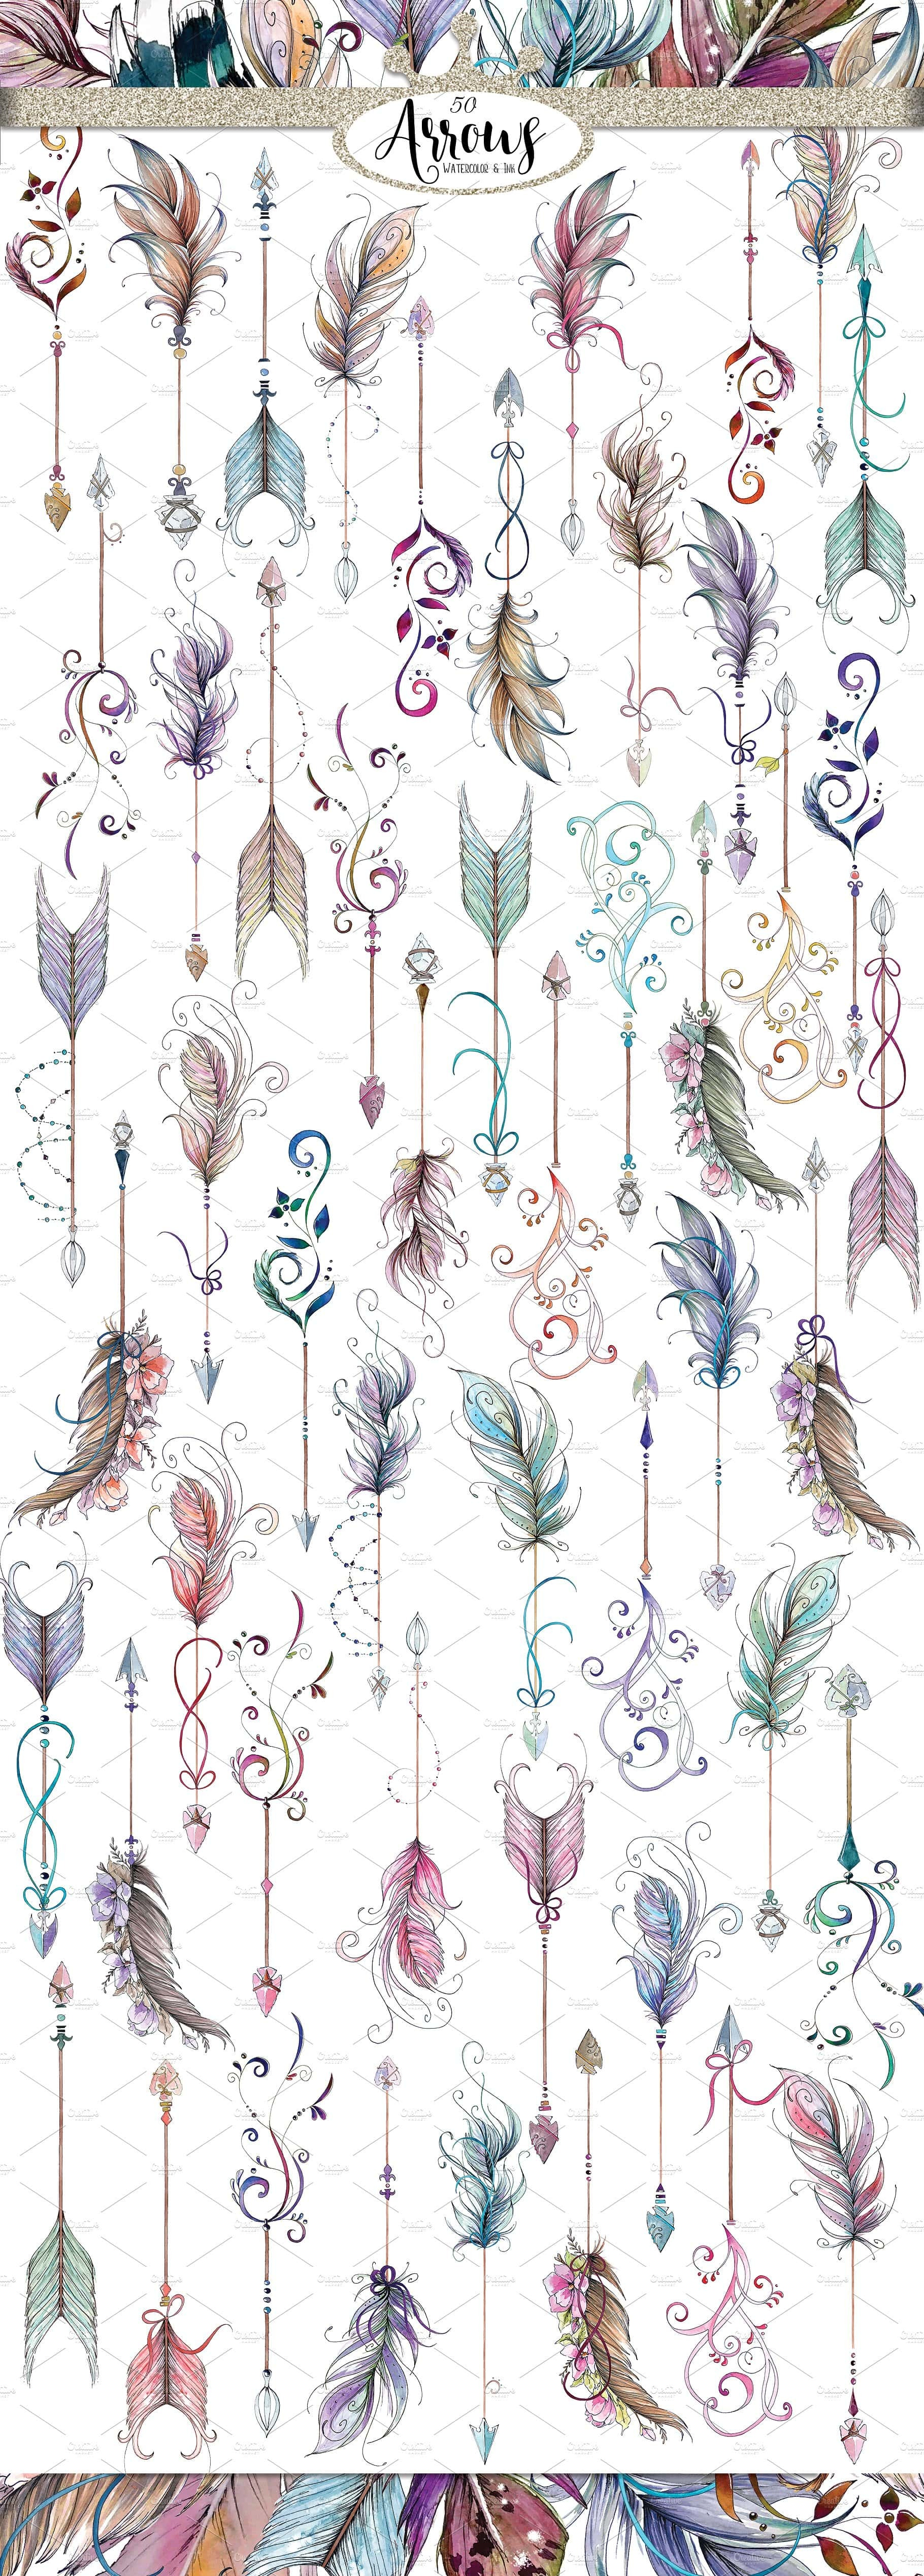 Watercolor & Illustration Bundle 2